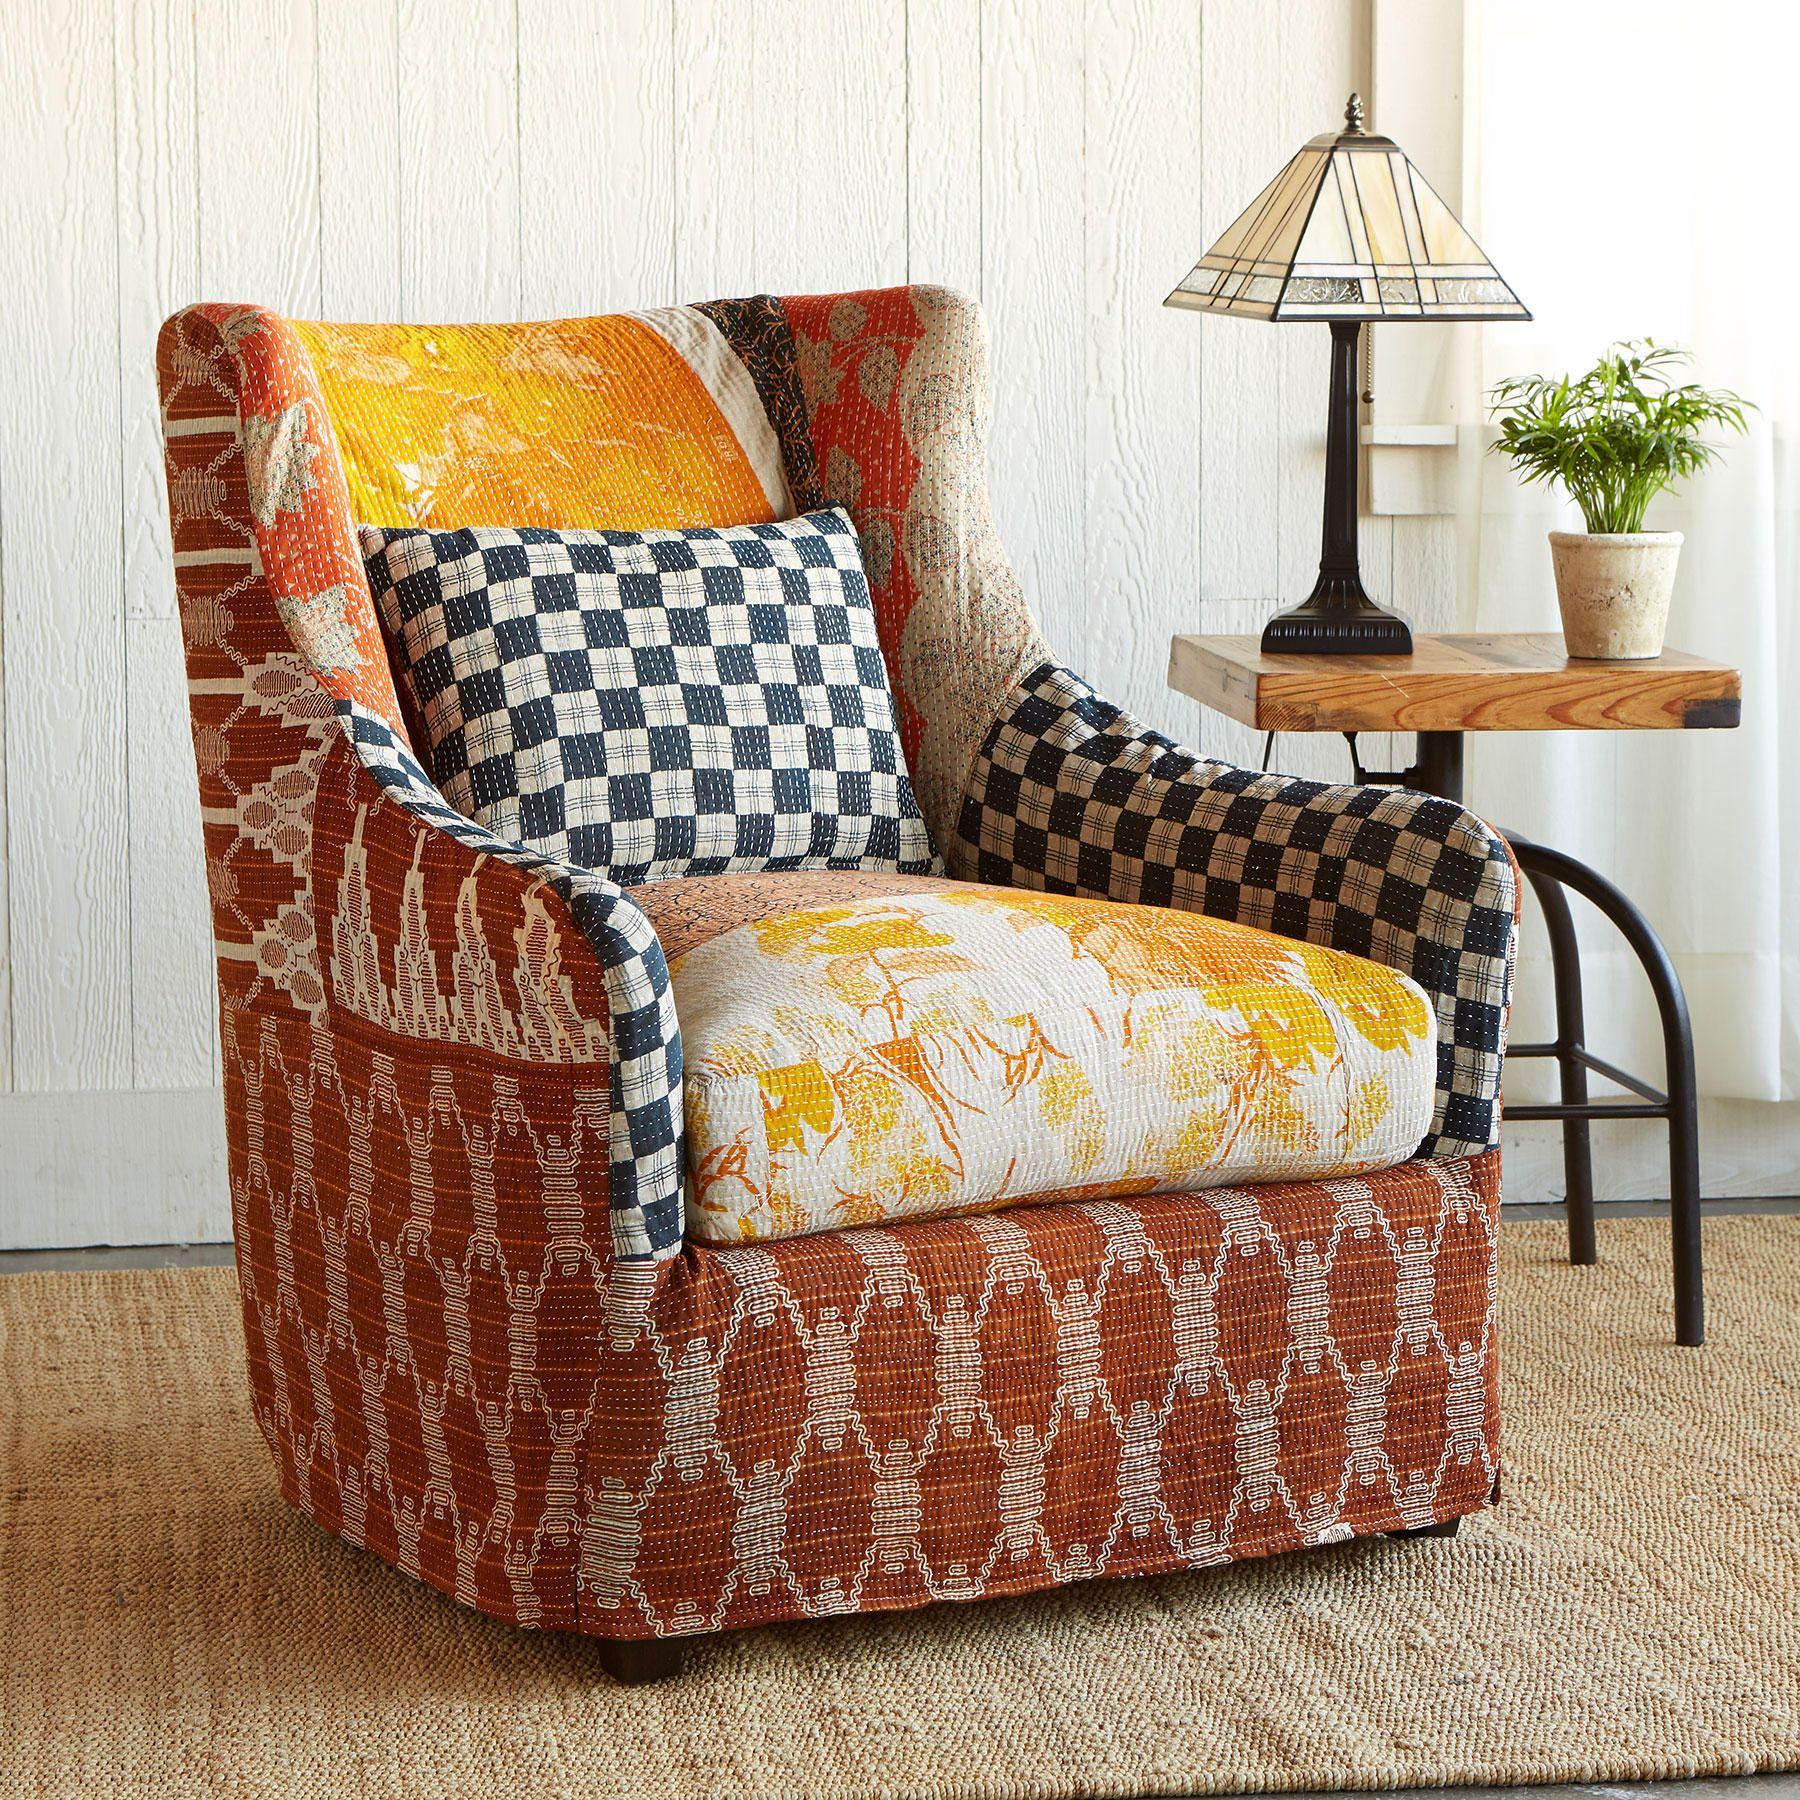 Khajjiar slipcovered sari chair precious patches of vintage khadi